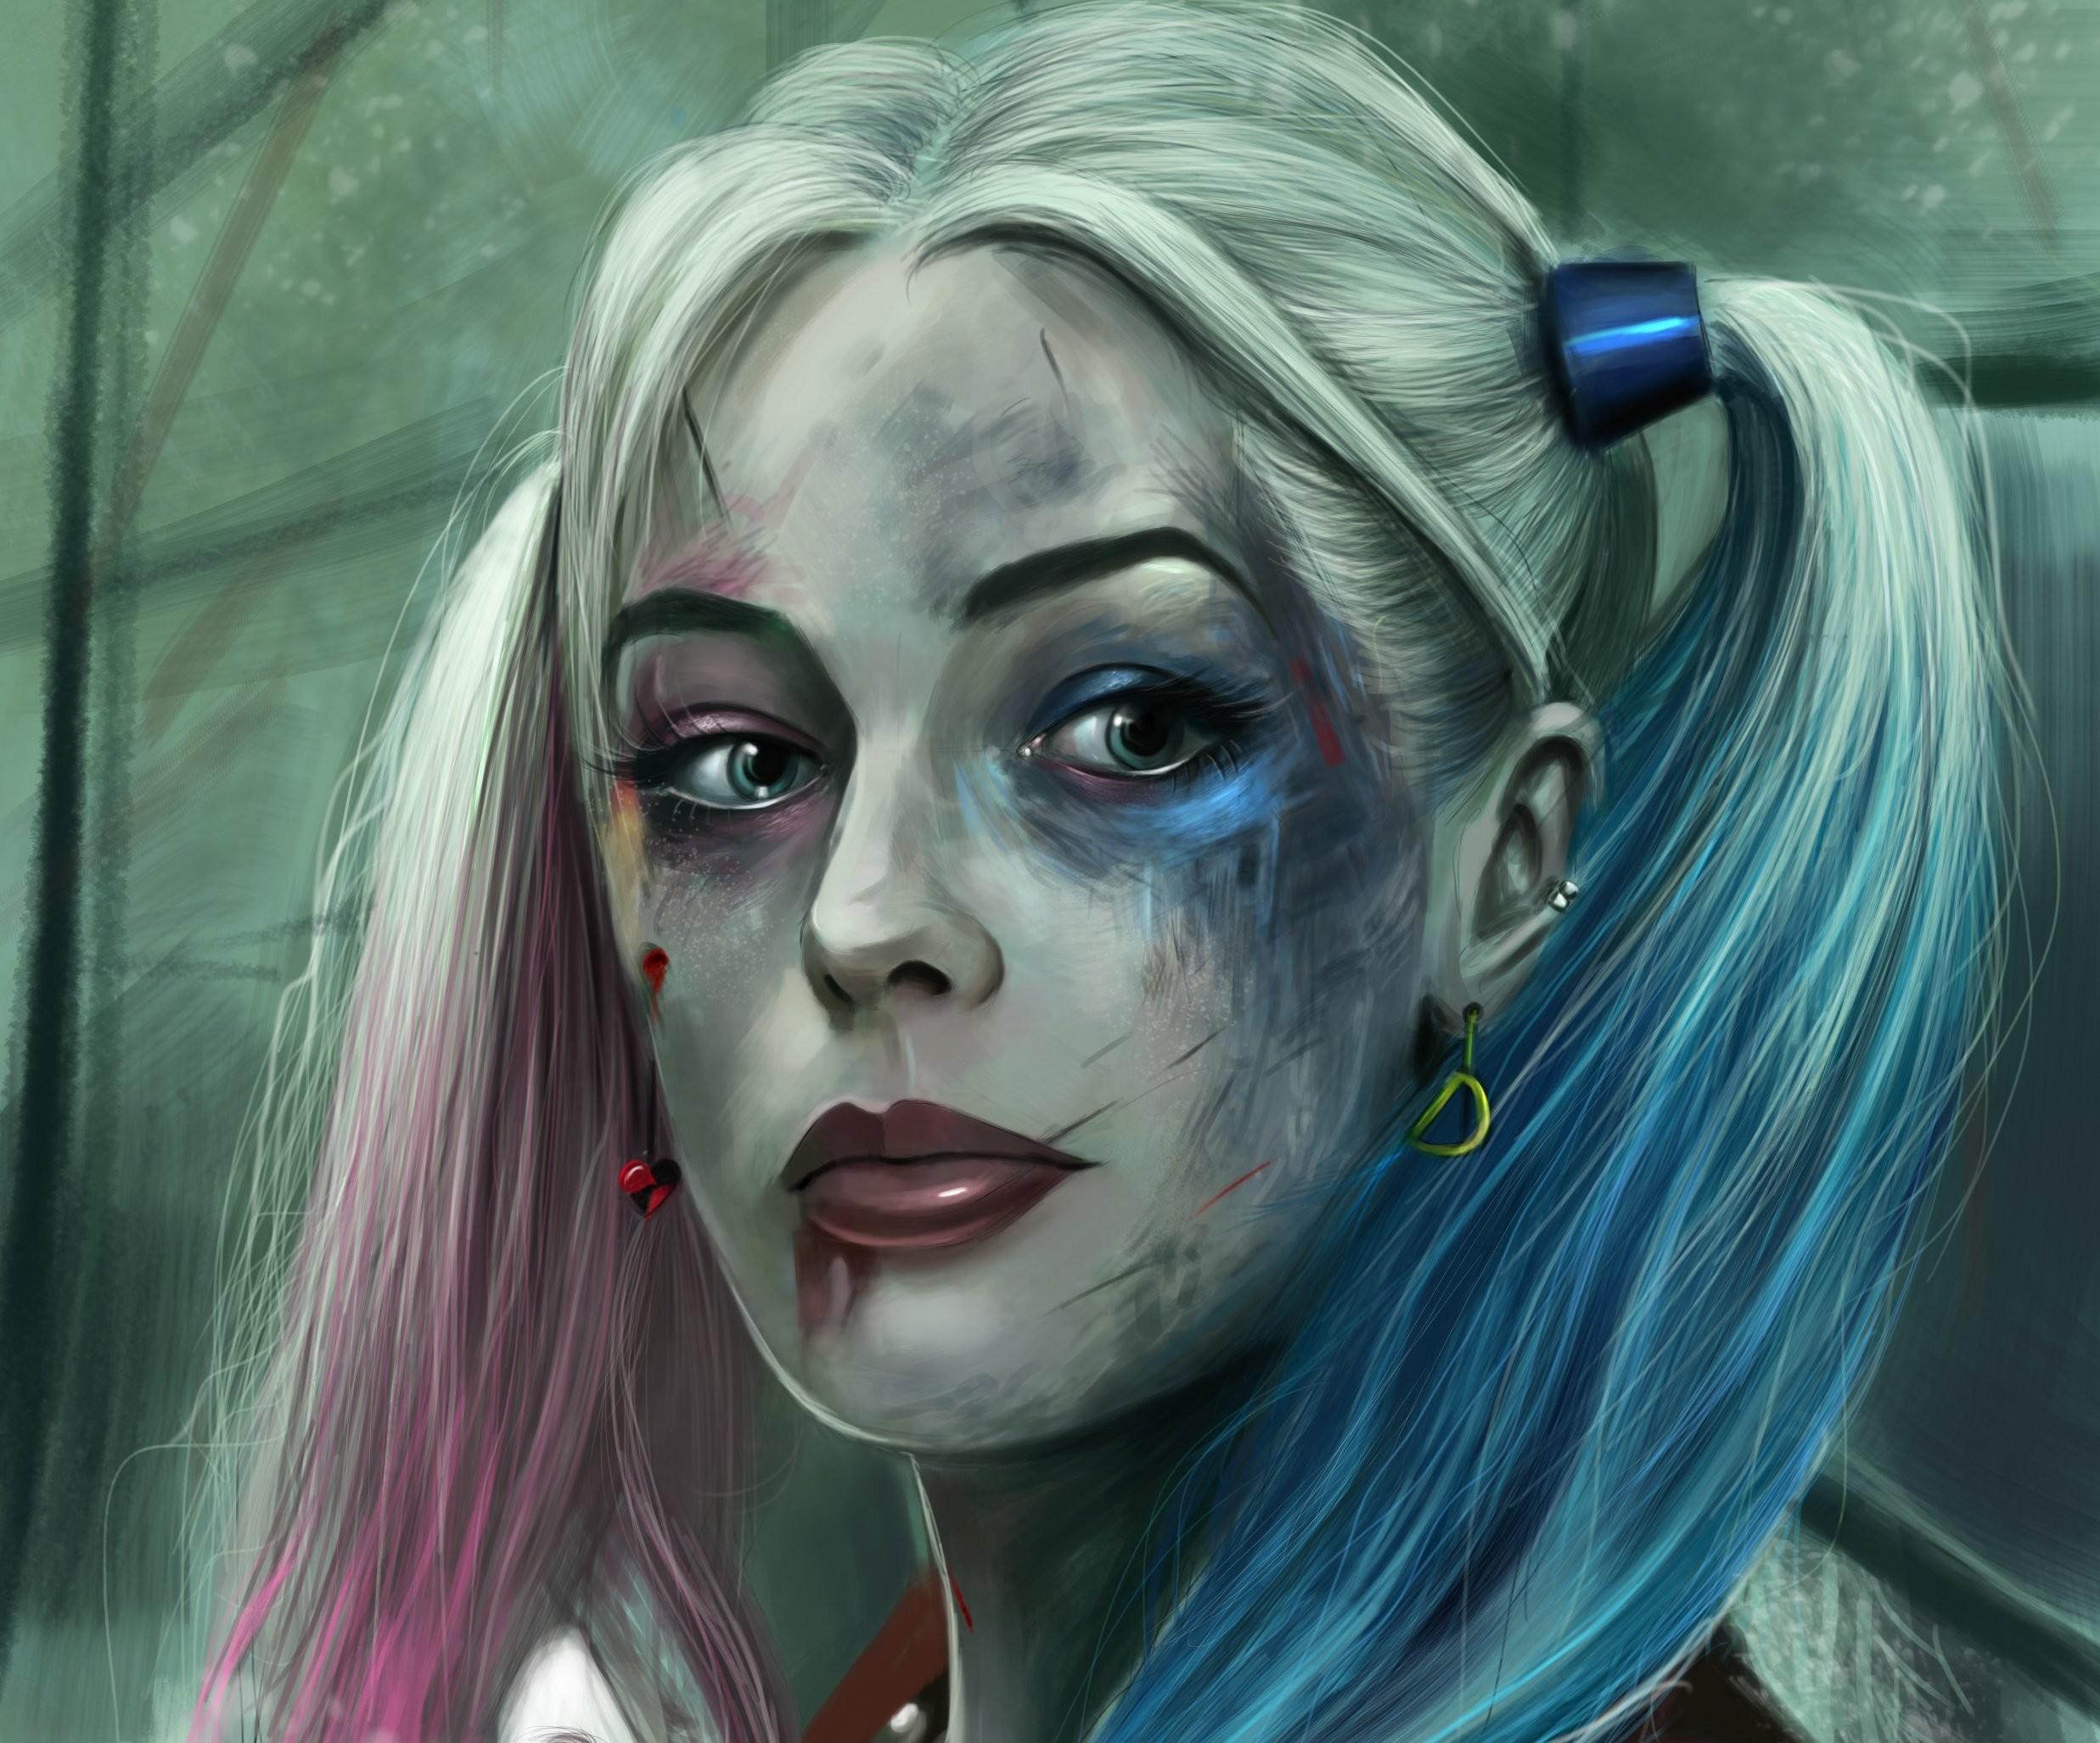 Harley Quinn Wallpaper Hd 1080p 78 Images